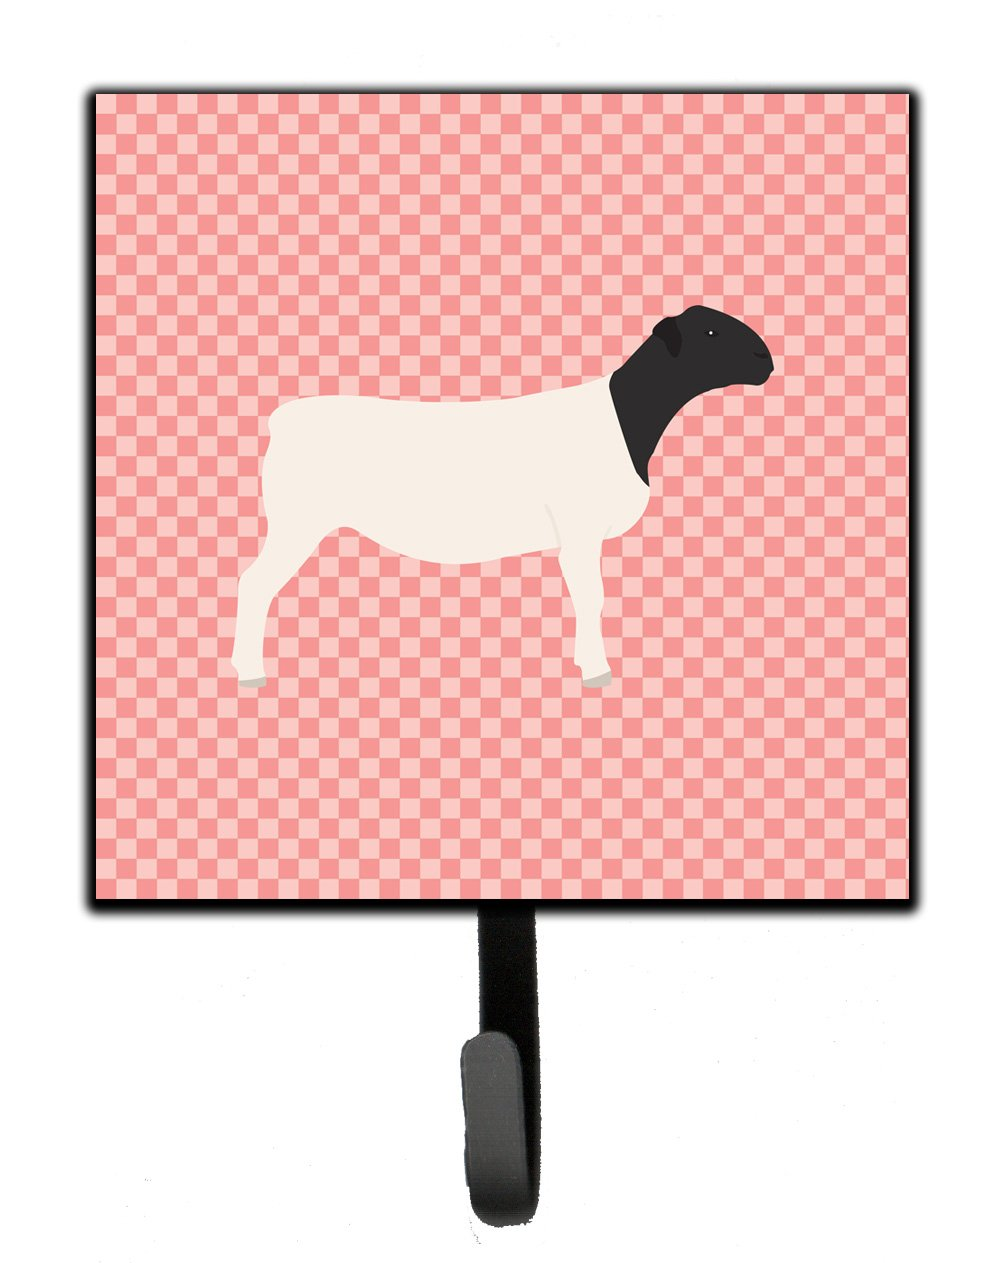 Carolines Treasures Dorper Sheep Pink Check Wall Hook Small Multicolor